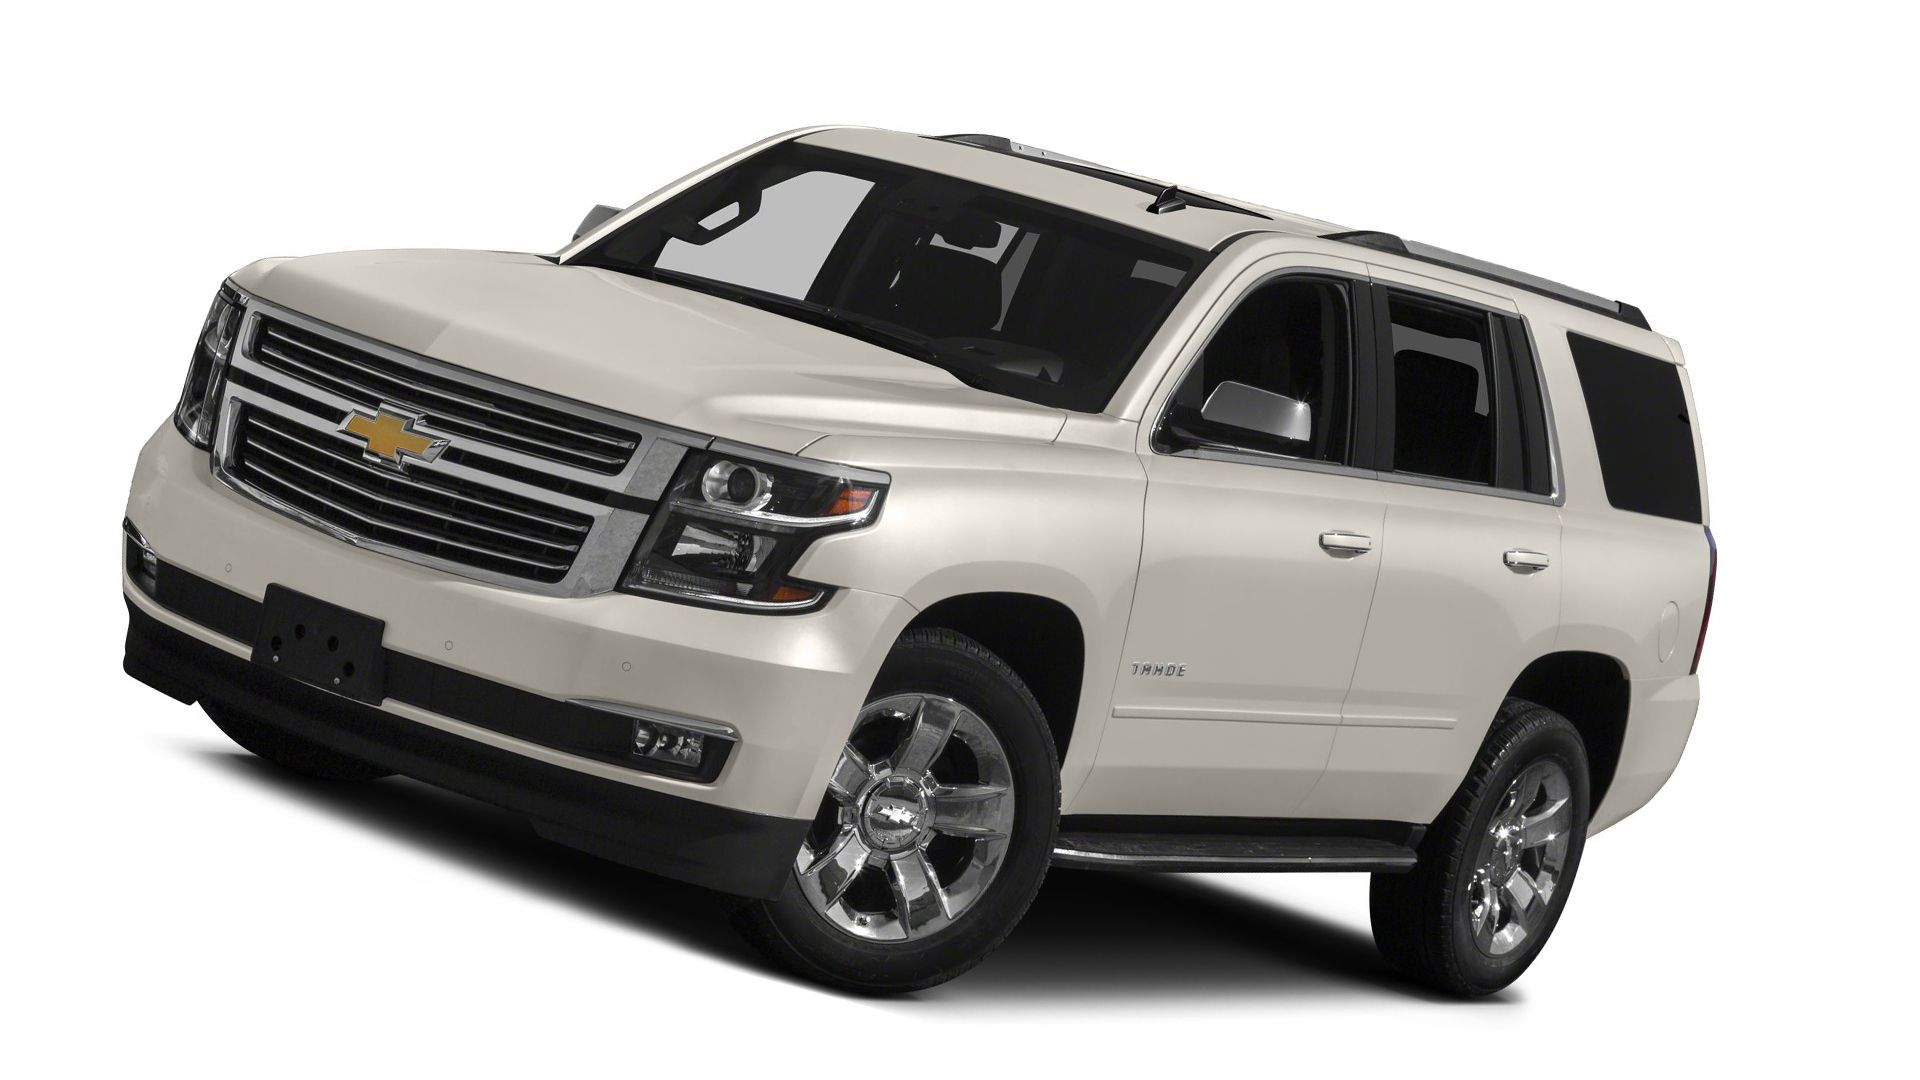 New 2019 Chevrolet Tahoe Price (с изображениями)